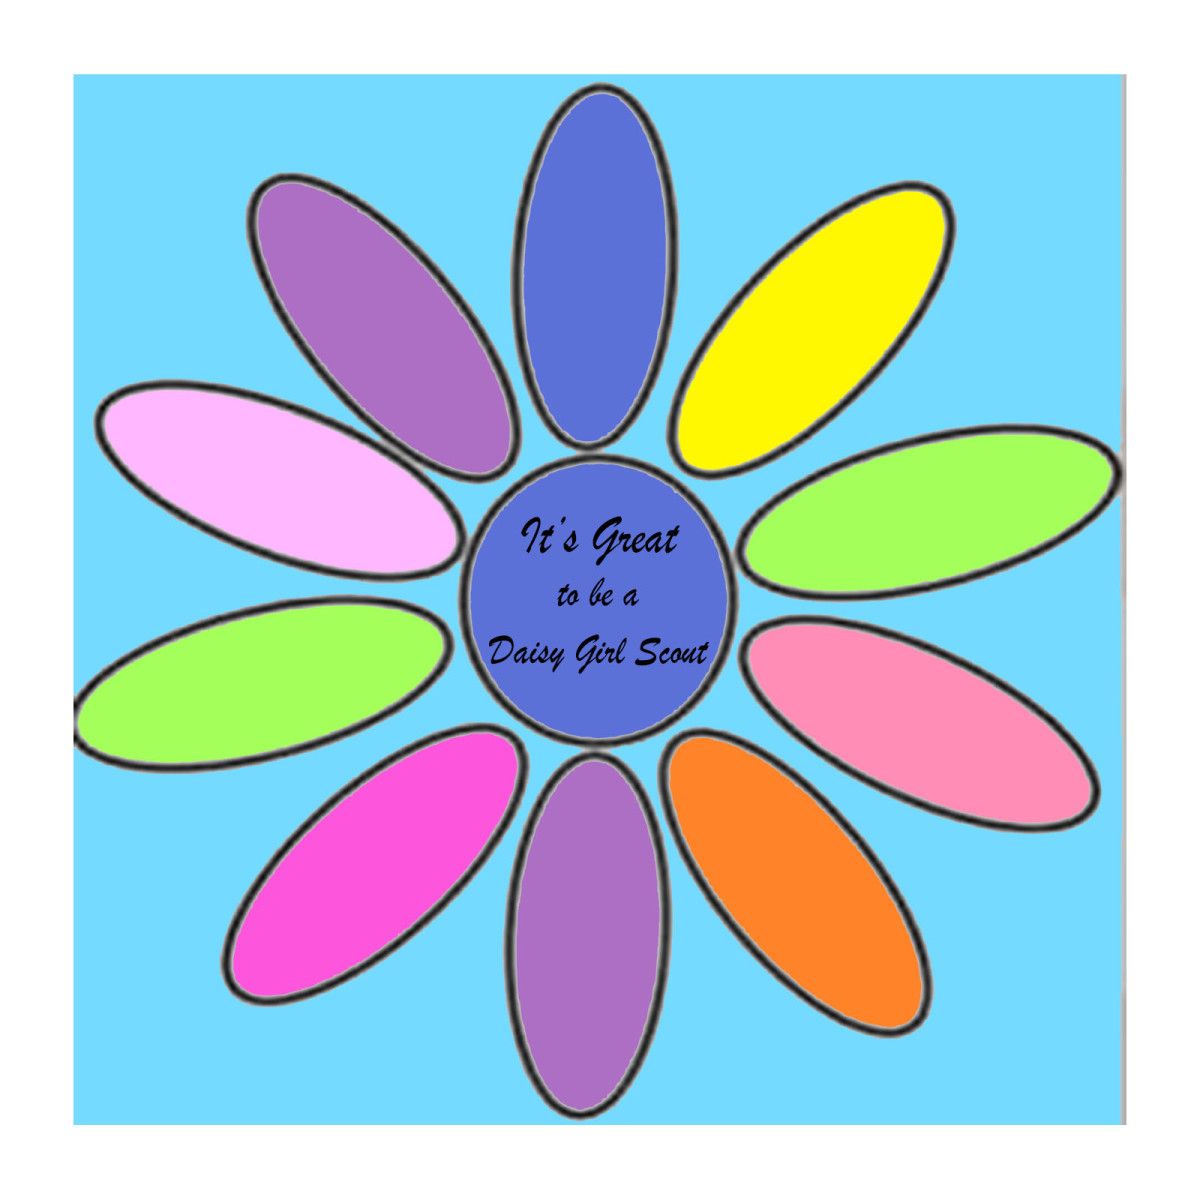 Daisy Girl Scout petals.